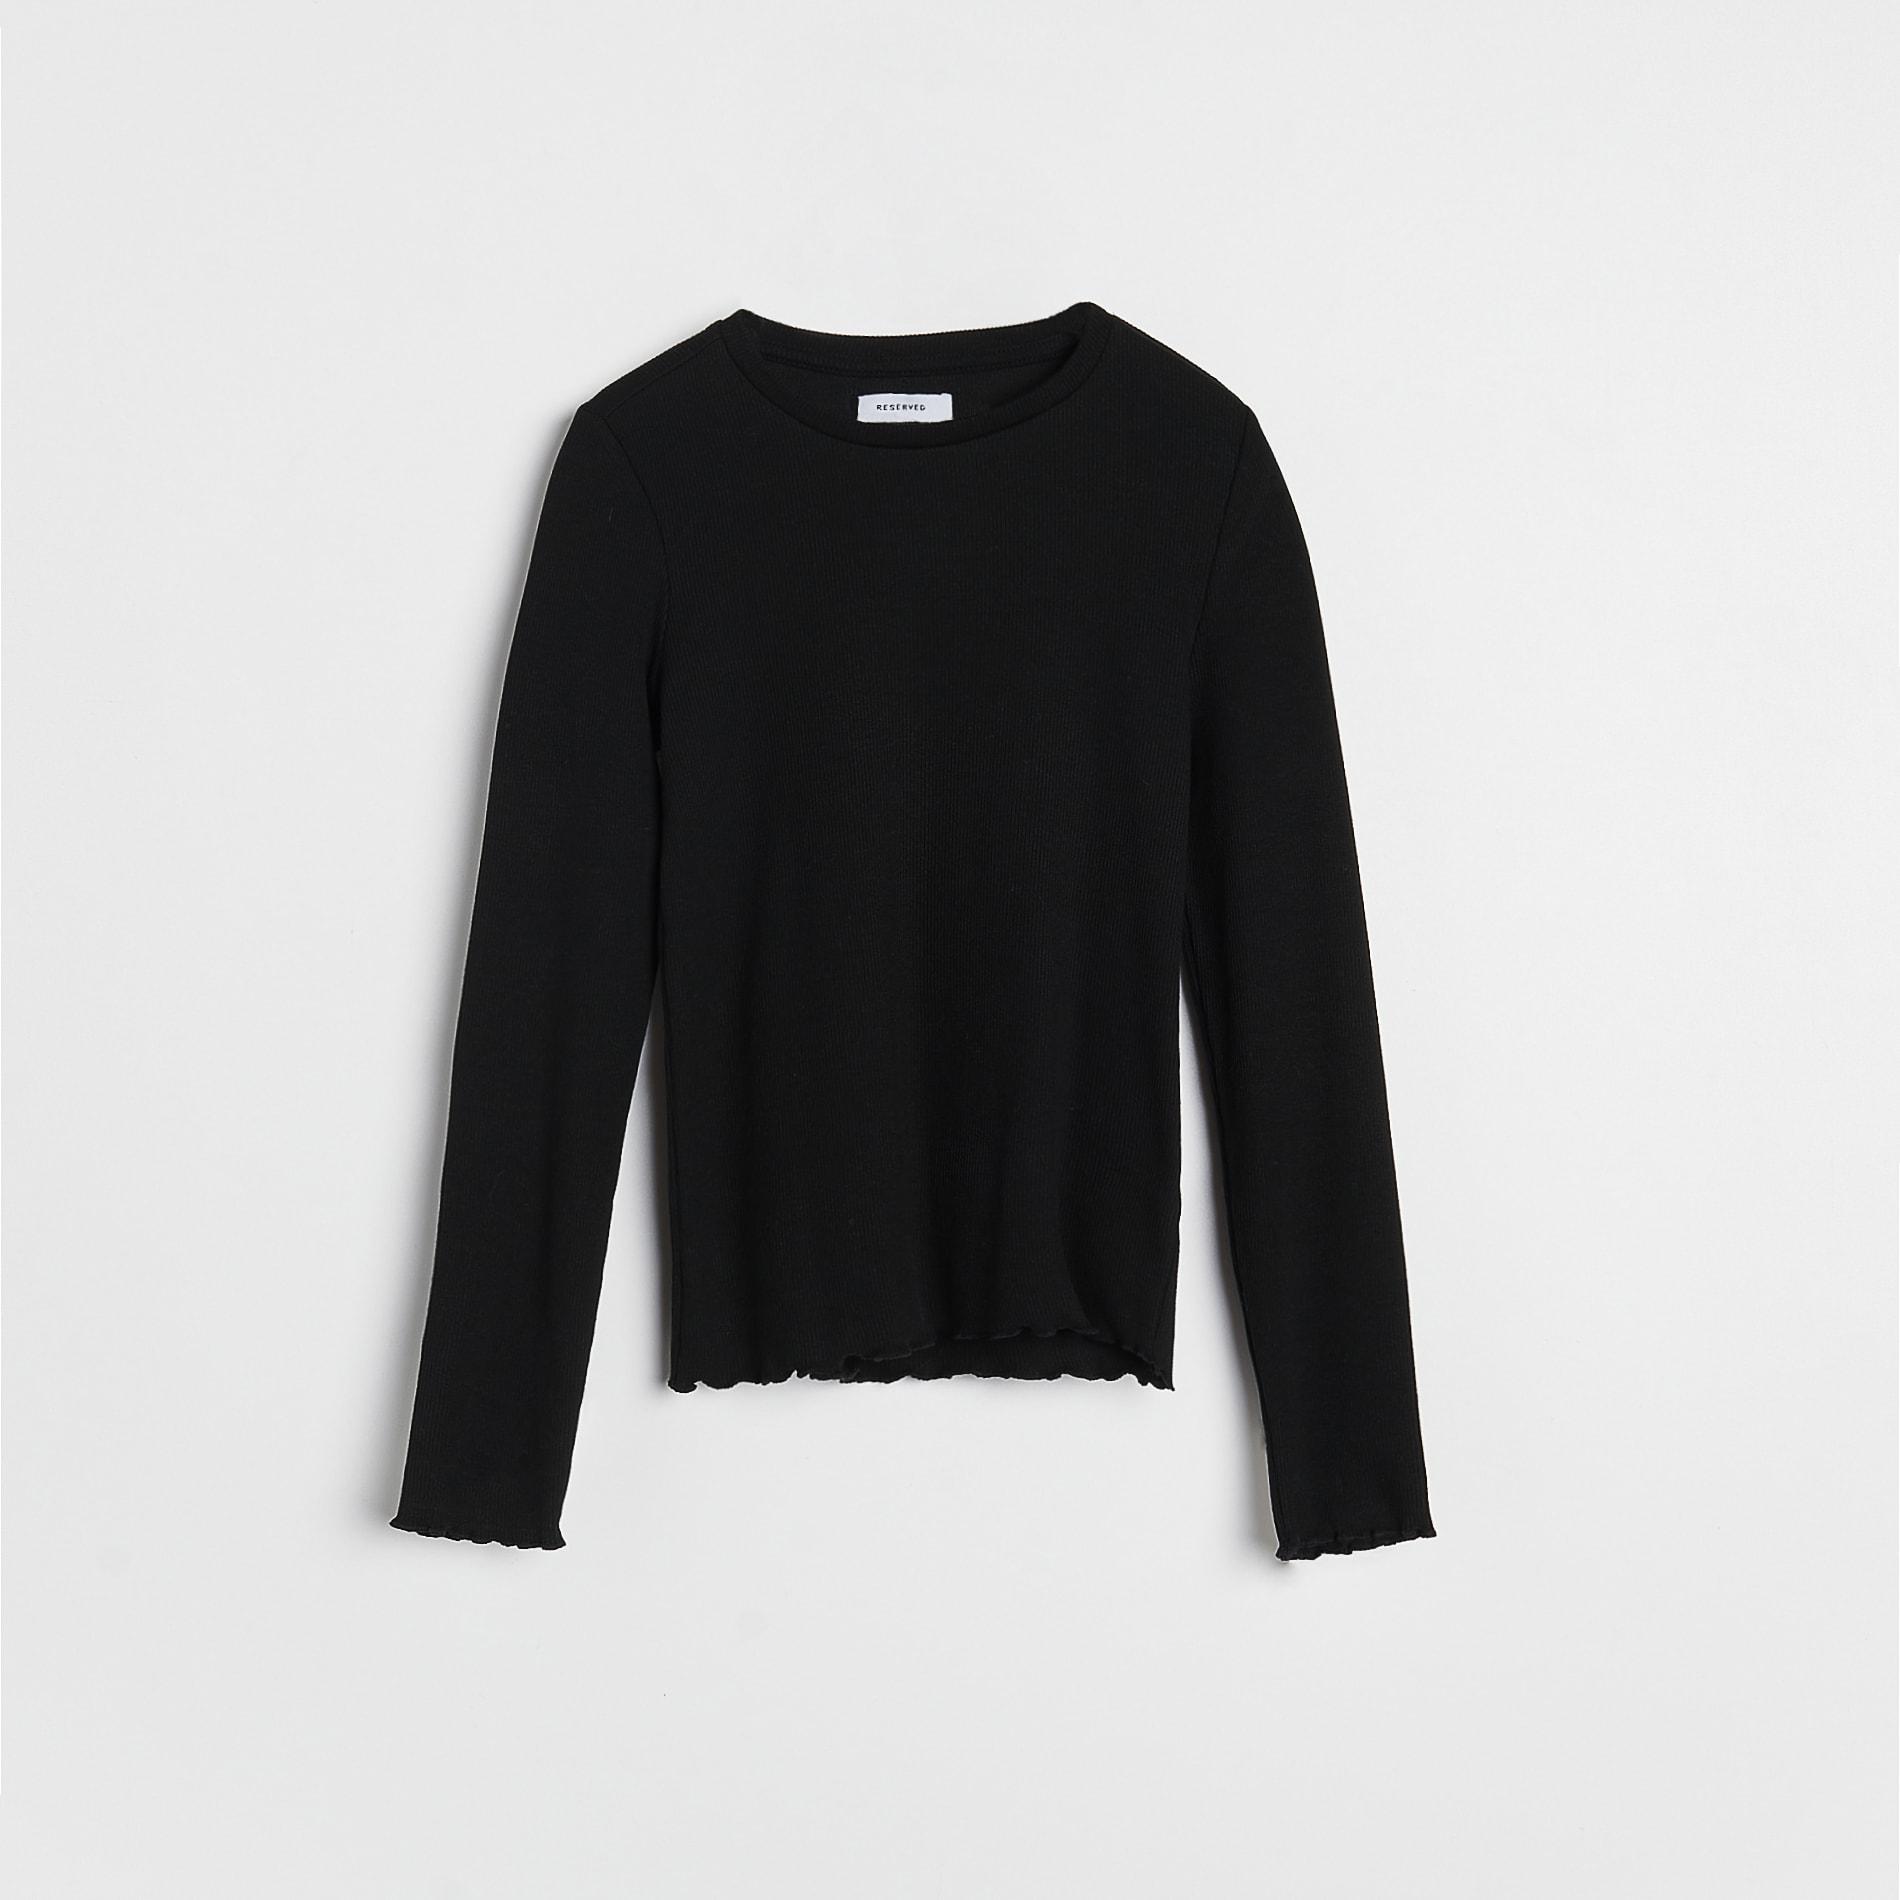 Reserved - Tričko s dlouhým rukávem - Černý